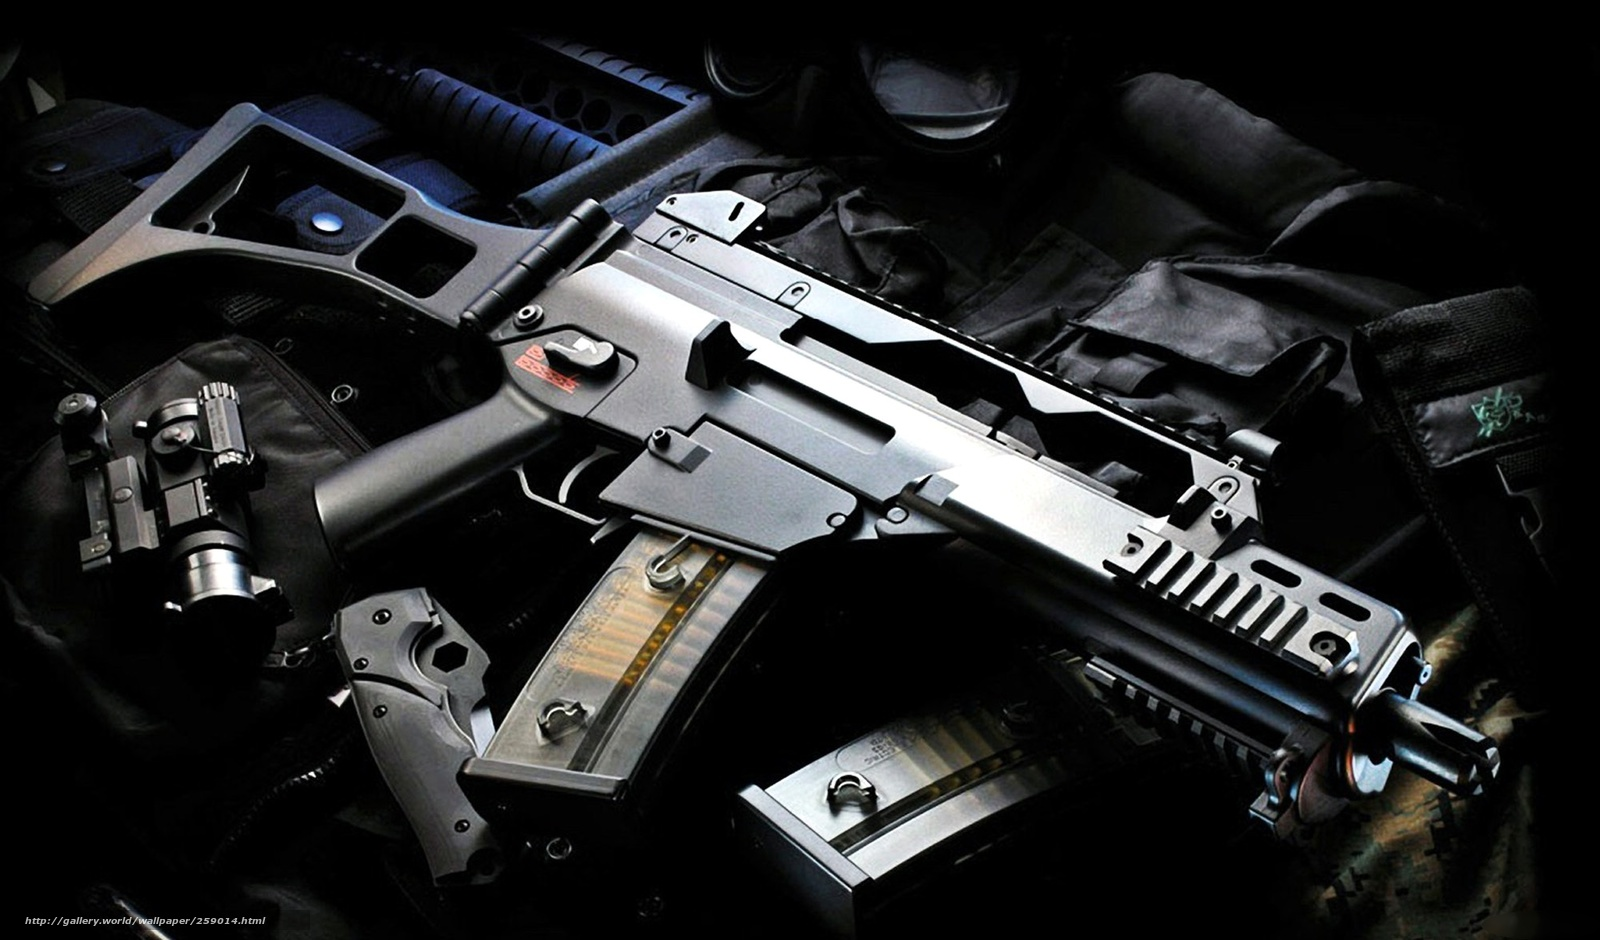 Artesanato Pernambuco ~ Armas de fogo; Pistolas; Espingardas; Escopetas